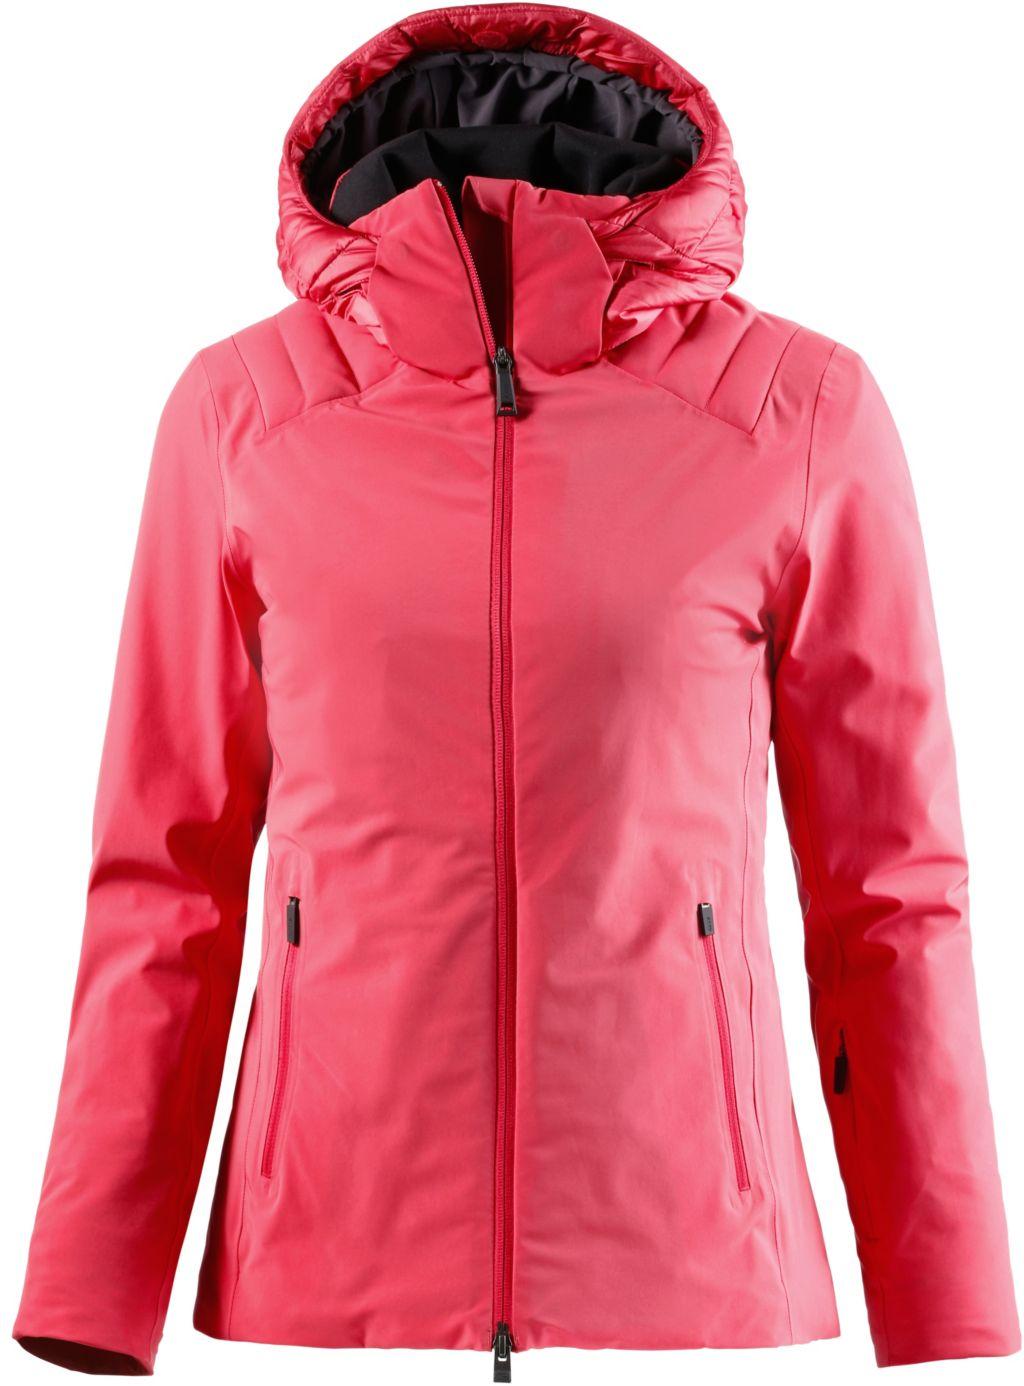 Scylla Skijacke Damen in rot, Größe 36